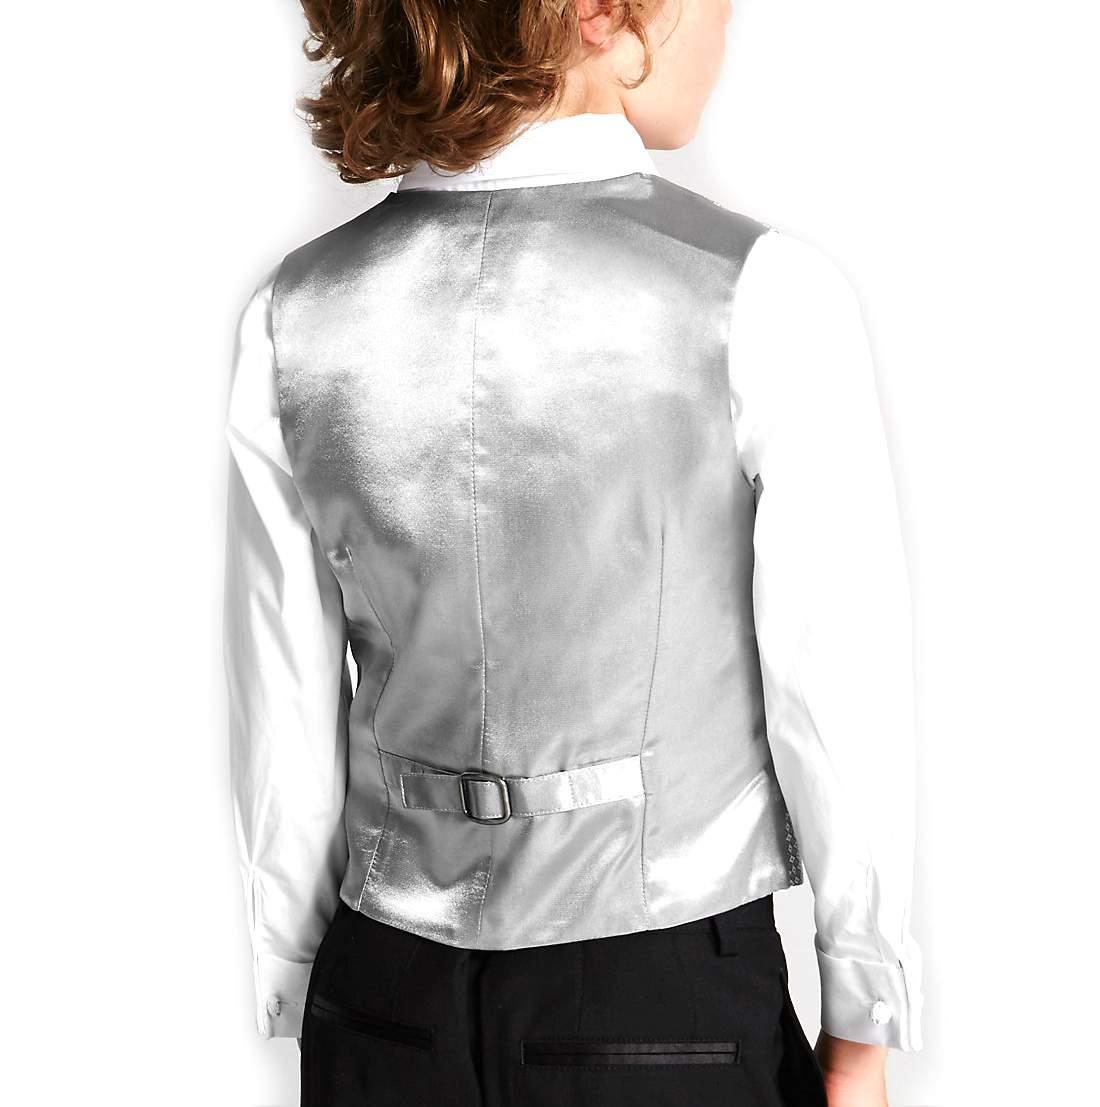 Childrens Kids Girls Moana Zipper Hooded Sweatshirt Hoodies Jacket #K87